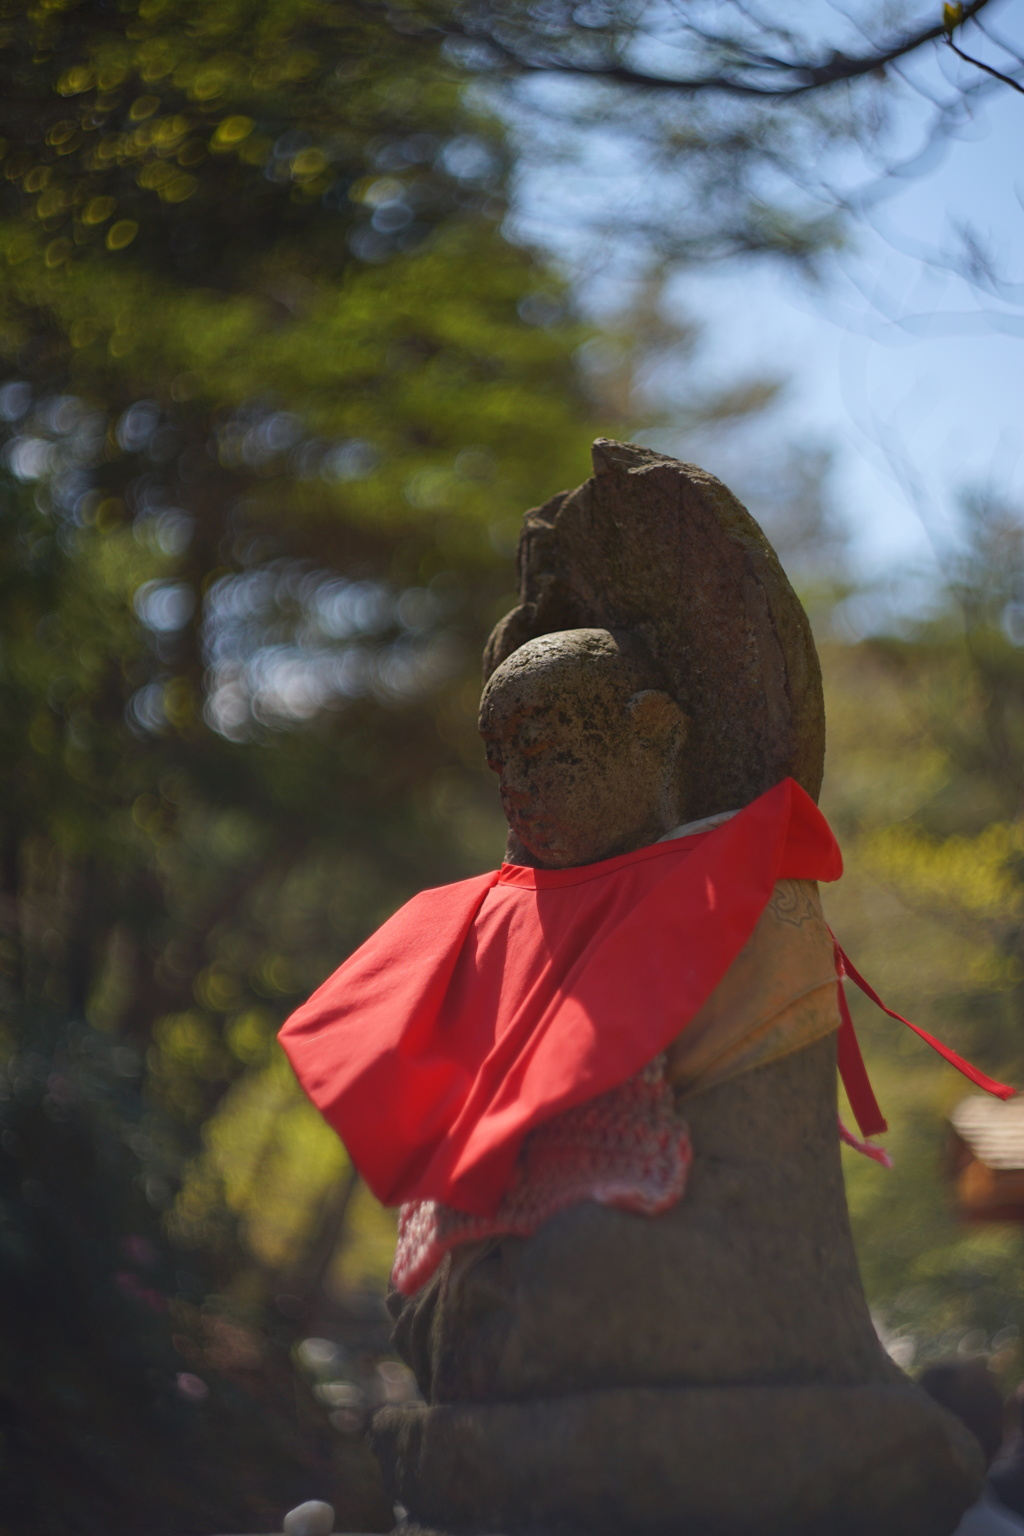 Helios44オールドレンズ試し撮り② 草津のお地蔵さん